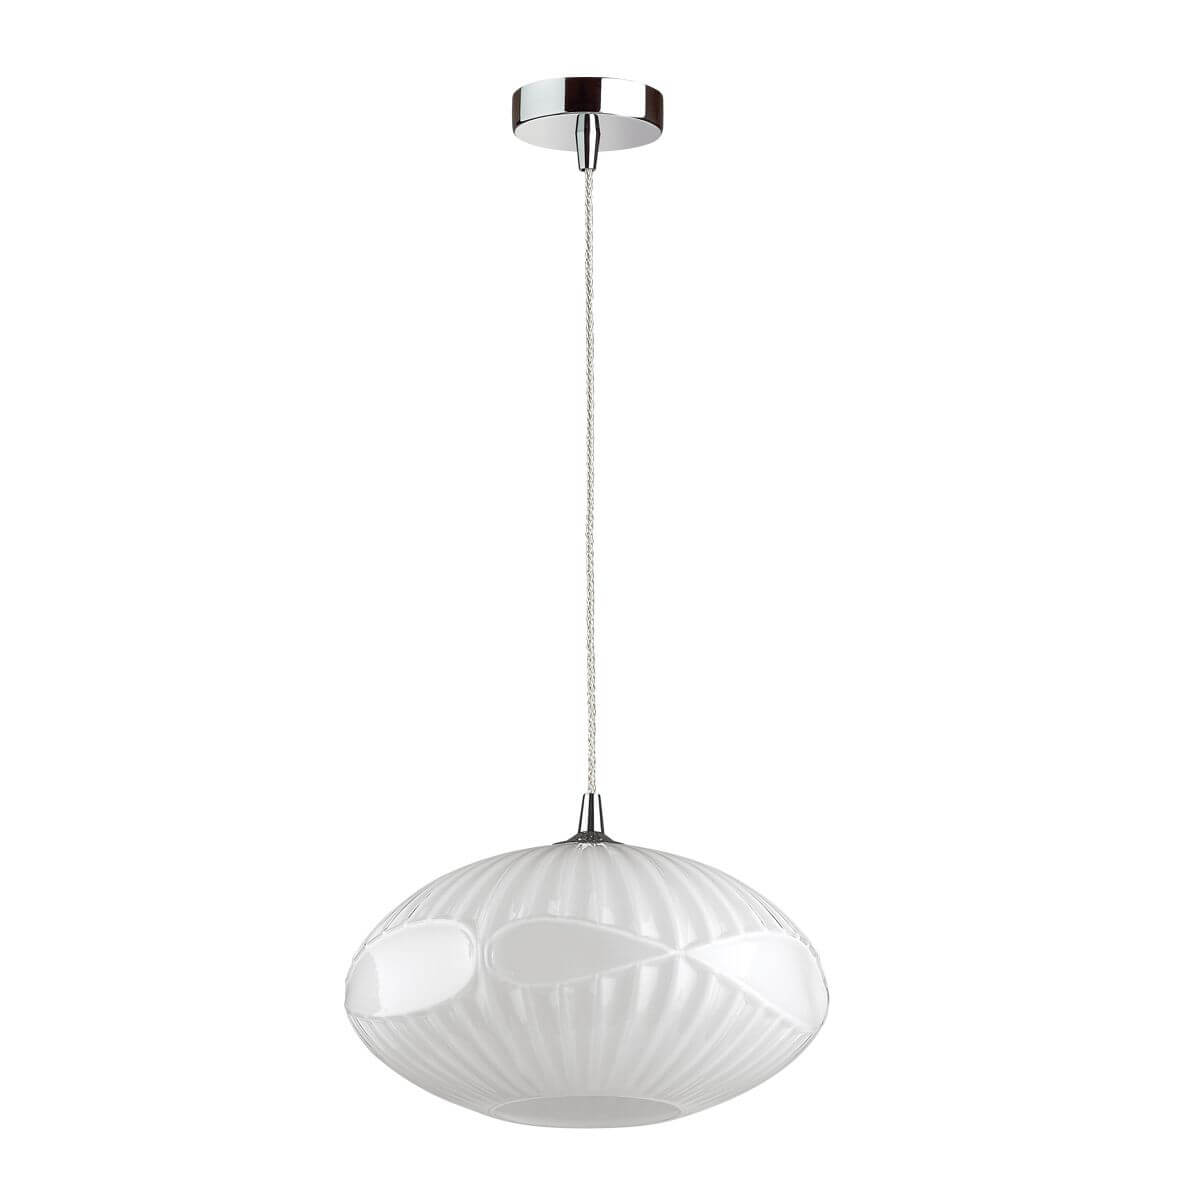 Светильник Odeon Light 4748/1 Pendant